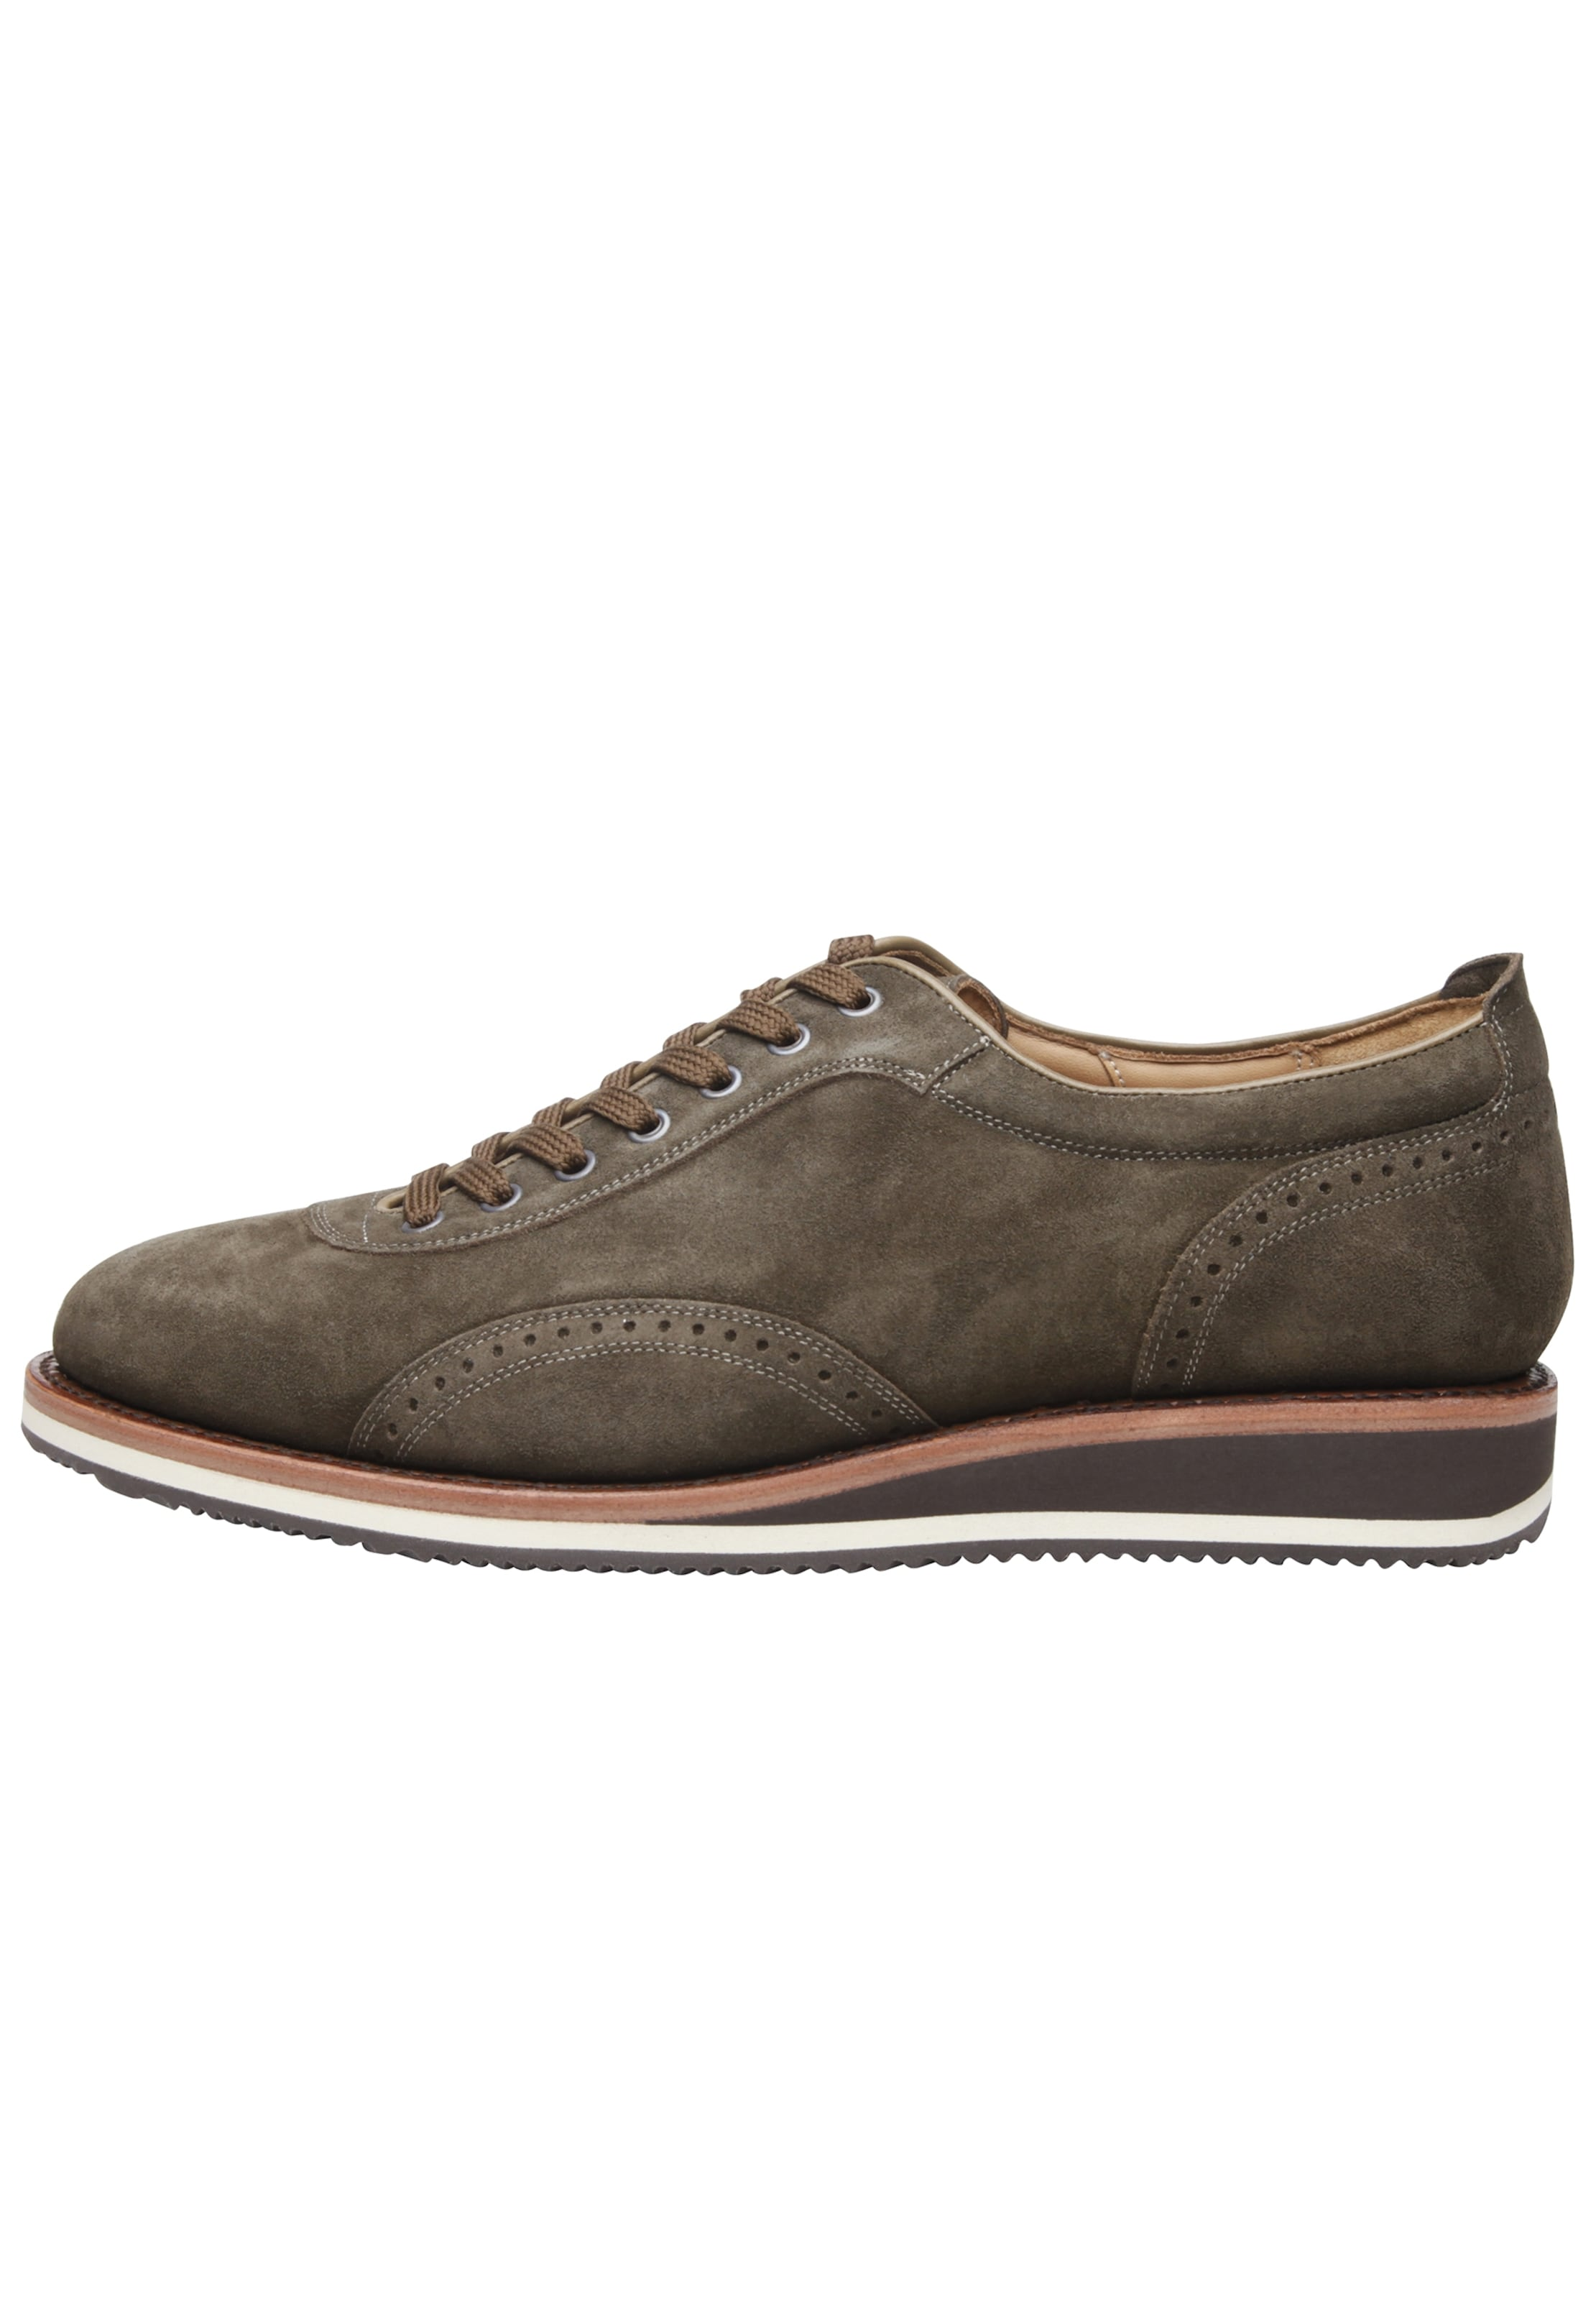 'no969' Halbschuhe Khaki Halbschuhe Shoepassion In 'no969' Shoepassion 3Rq45jcAL